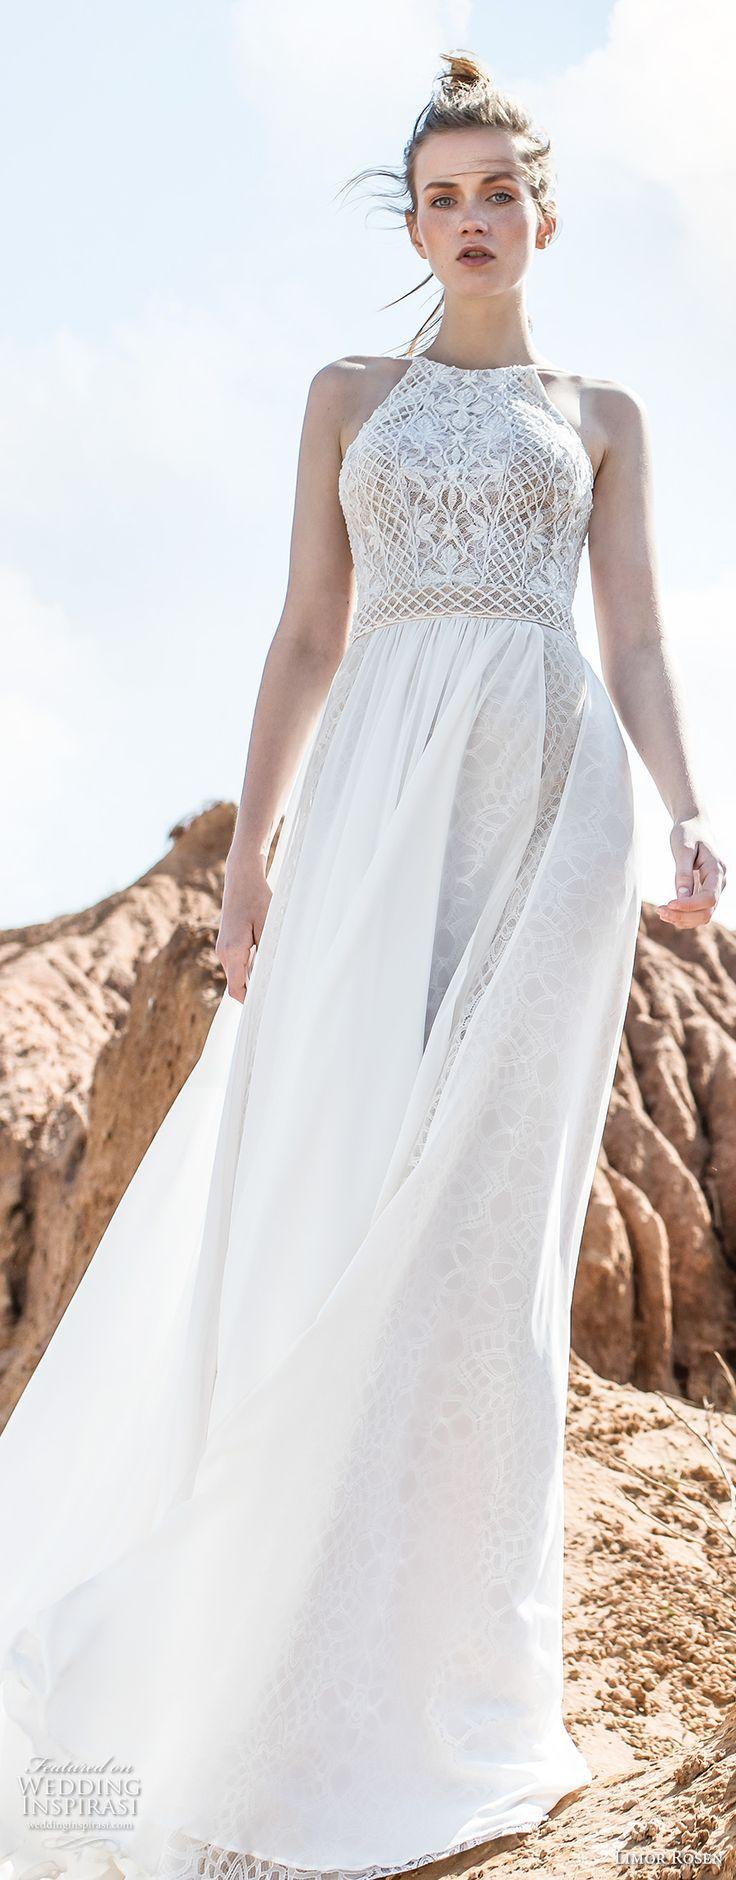 Popular Limor Rosen Wedding Dresses u ucFree Spirit ud Bridal Collection